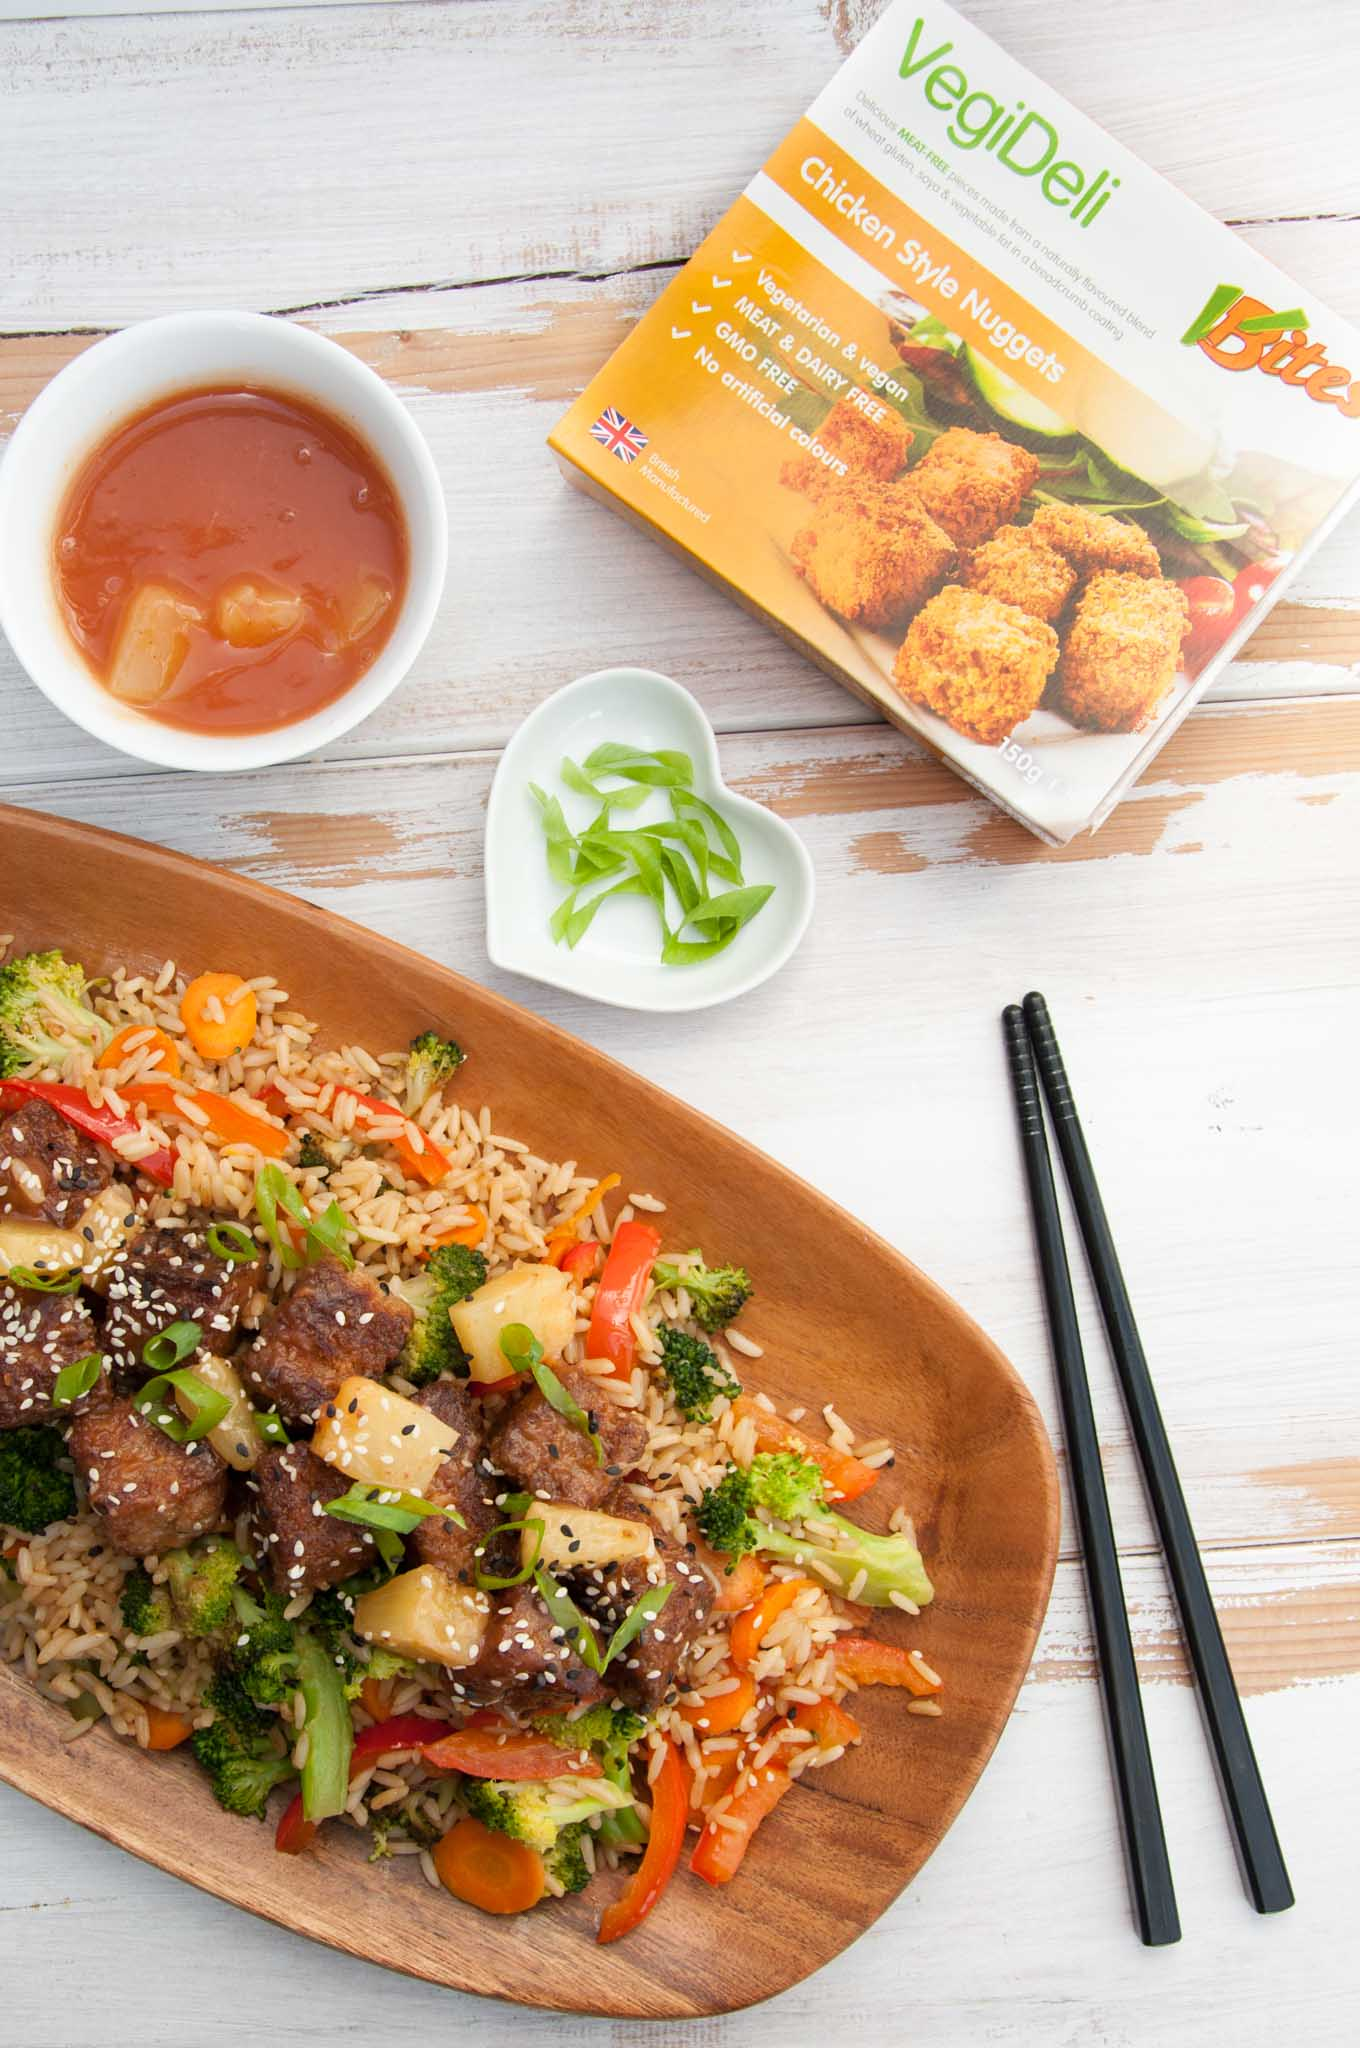 Vegan Sweet And Sour Mock Chicken on Fried Rice |ElephantasticVegan.com